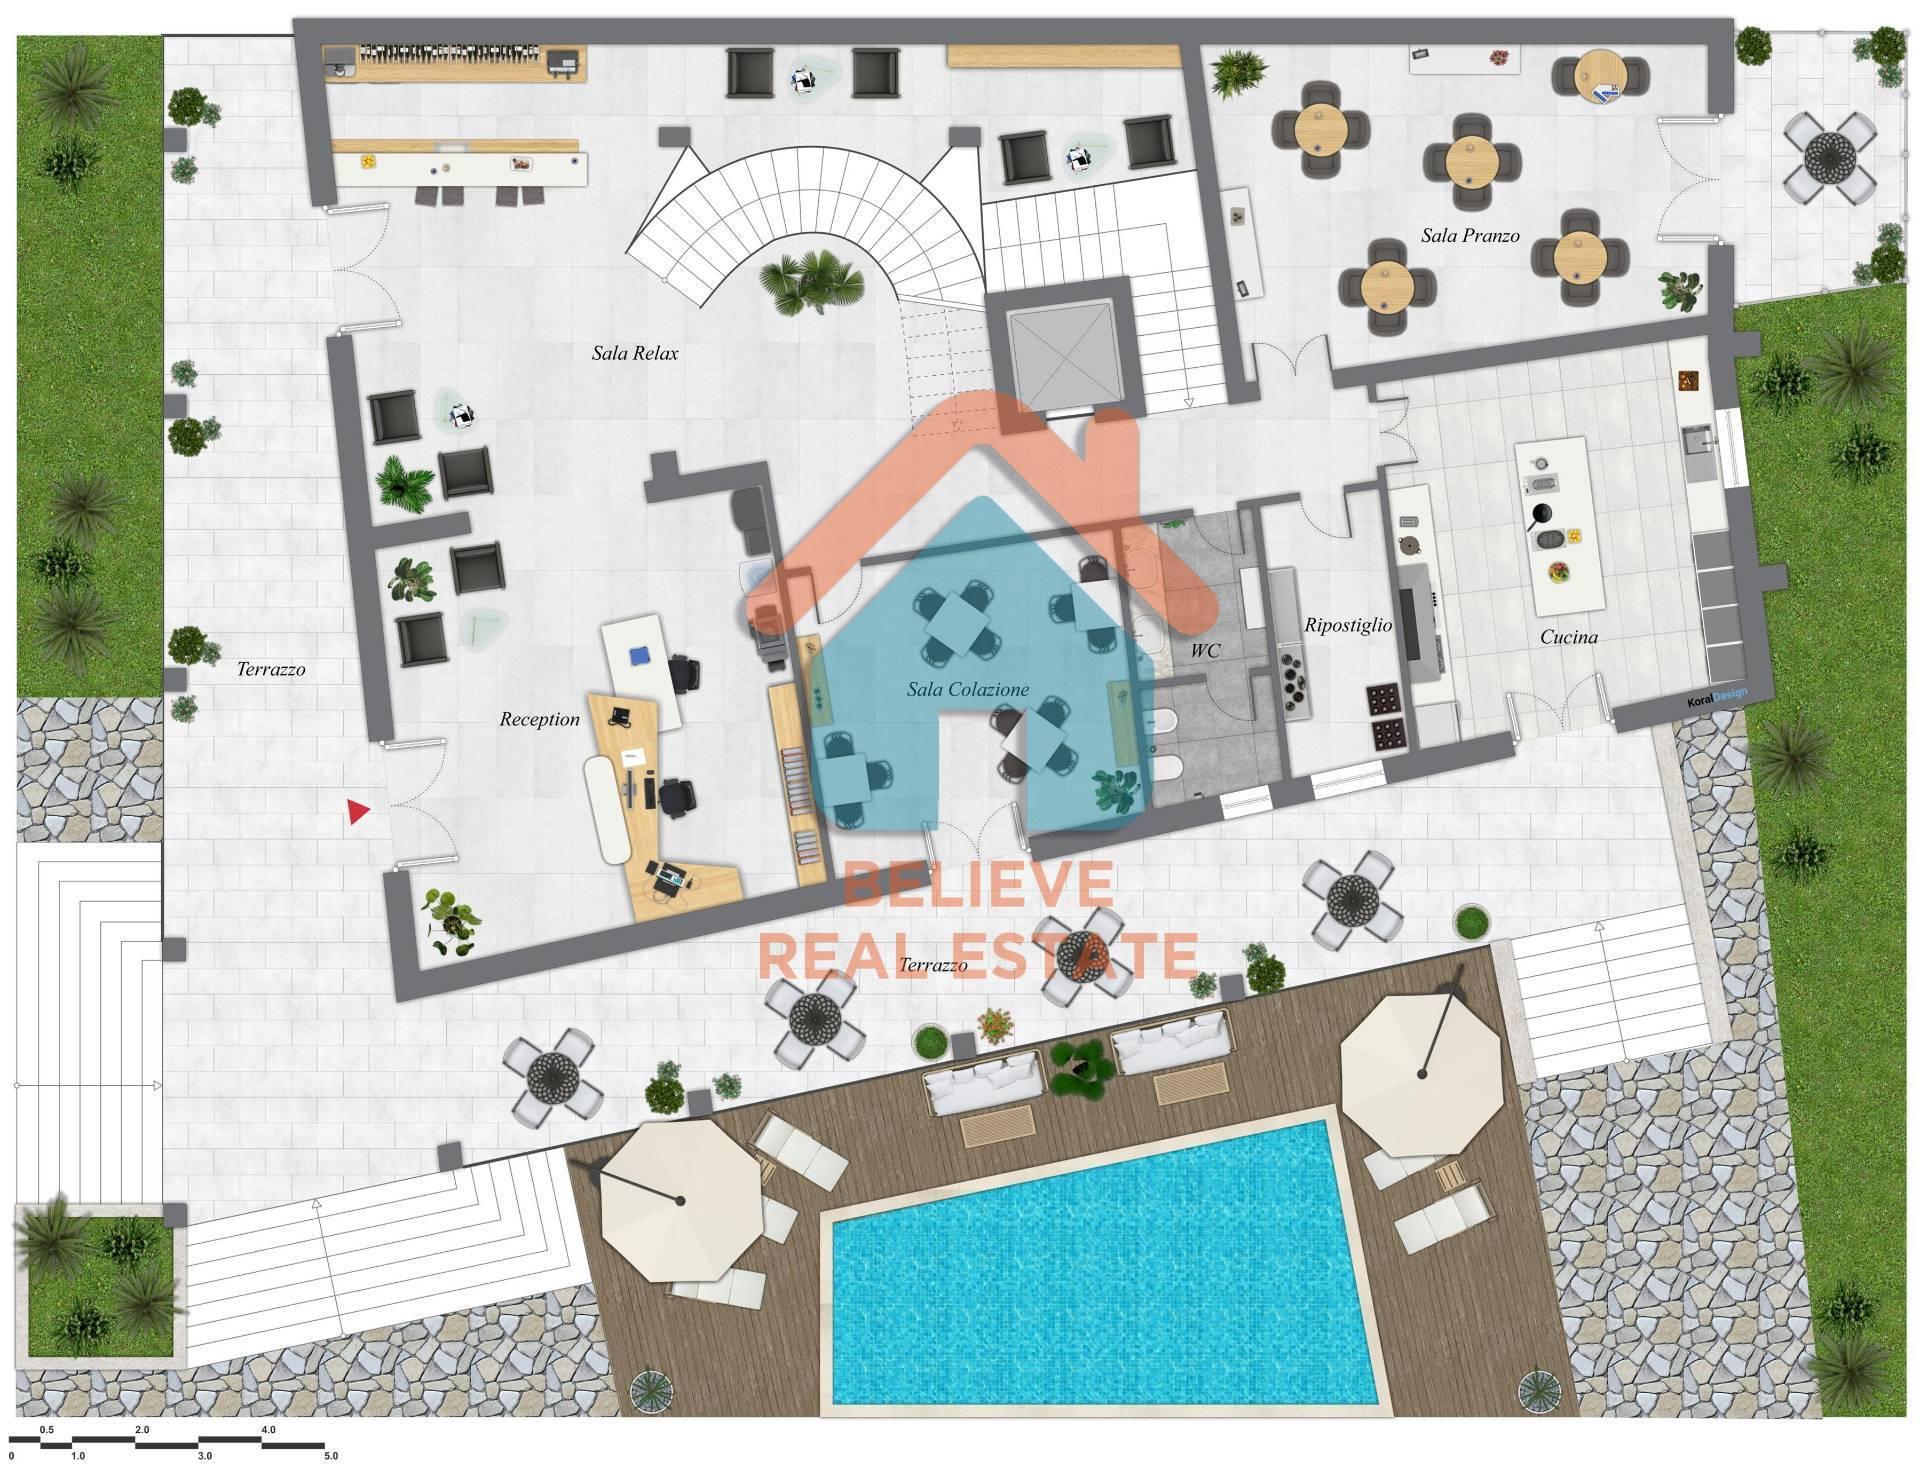 Villa - Casa, 1,120 Mq, Vendita - Foggia (FG)